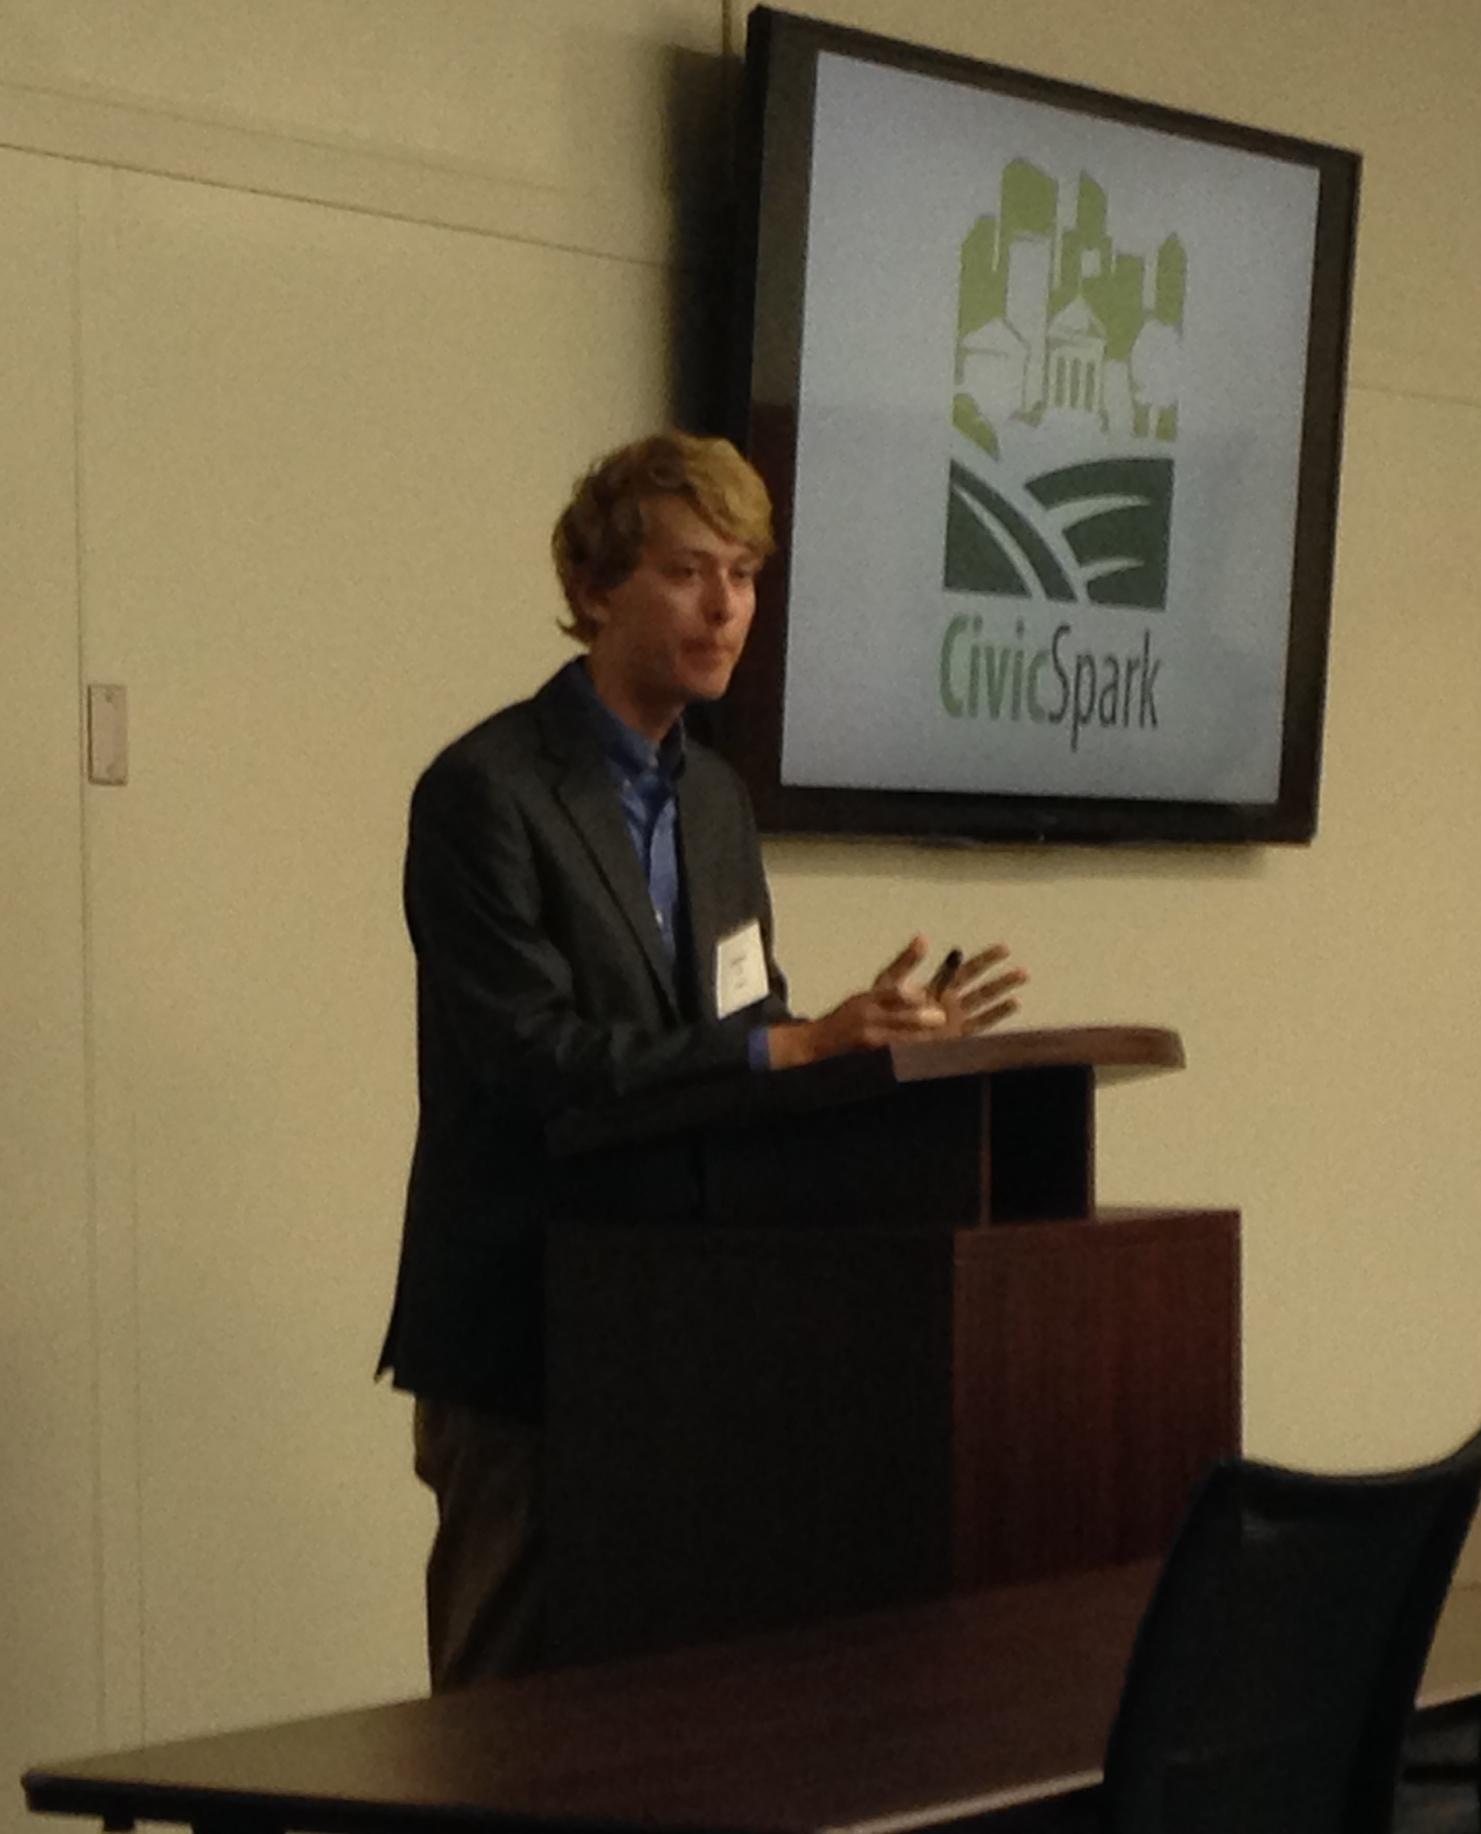 Civicspark member, Andrew Kopp, describes program details to our audience